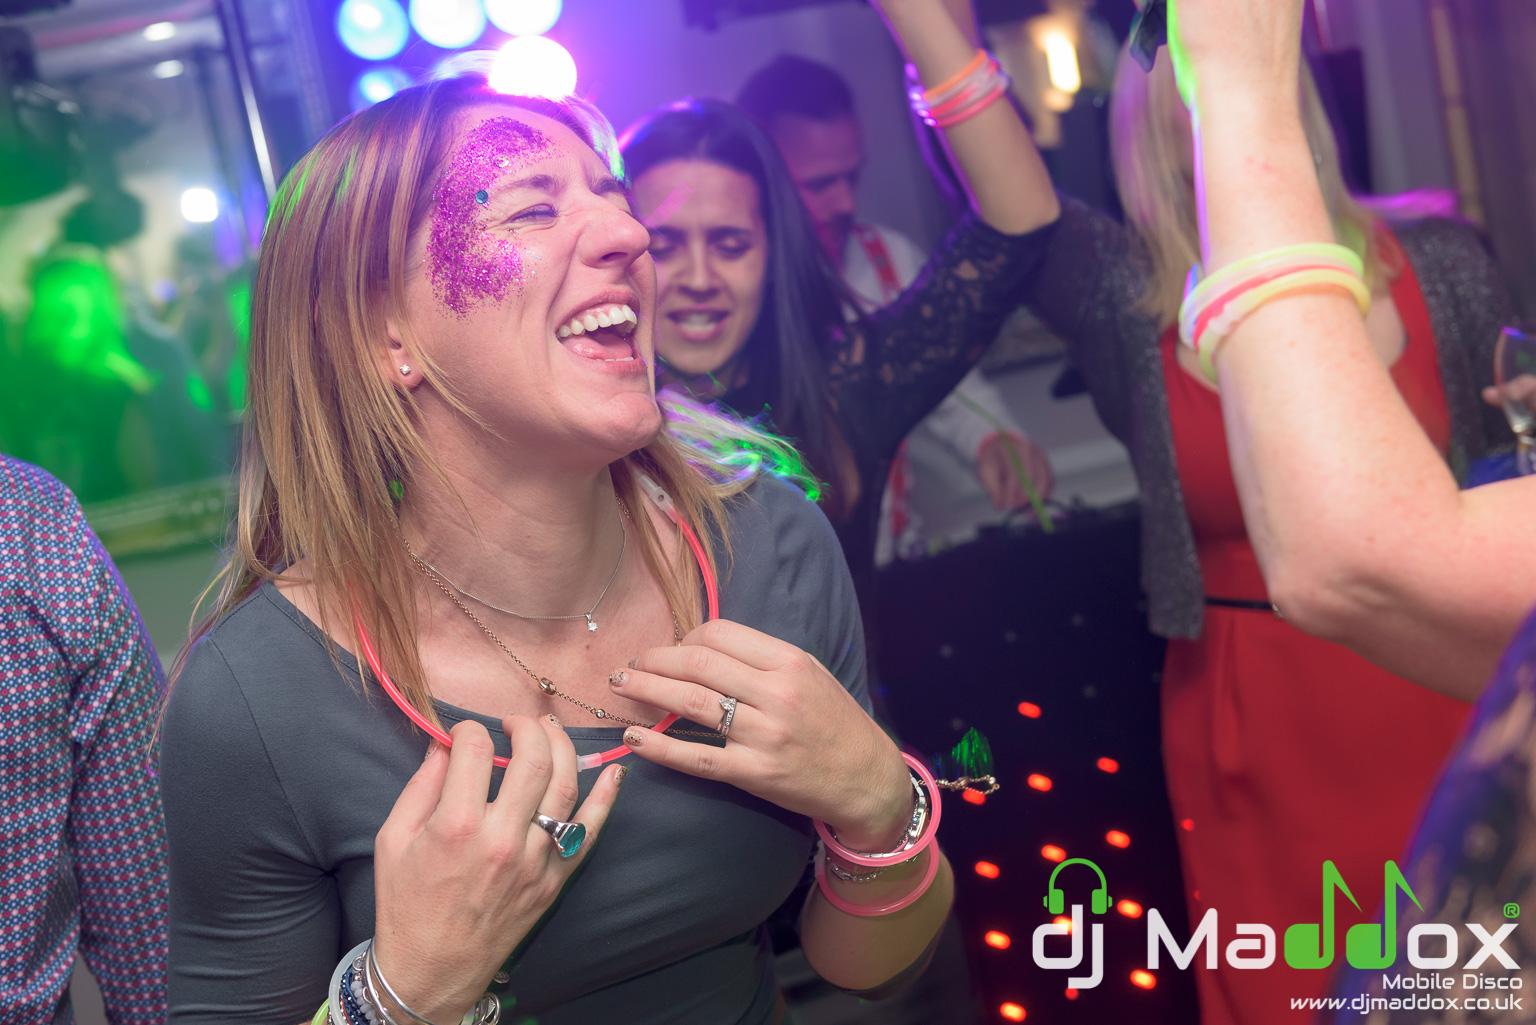 Don's 50th Birthday - DJ Maddox Mobile Disco & Wedding DJ